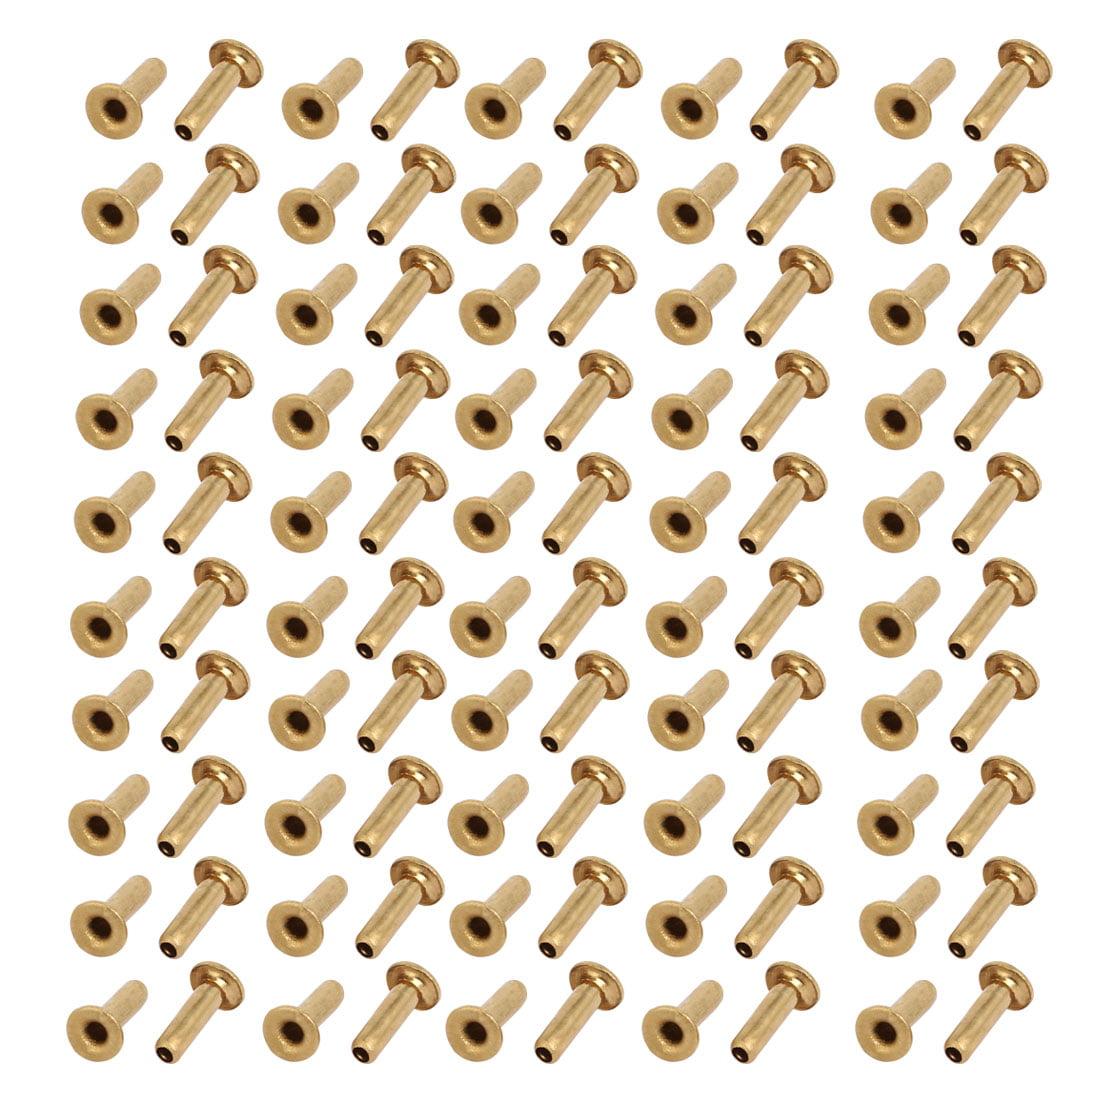 100pcs M2x7mm Brass Plated Metal Hollow Eyelets Rivets Gold Tone